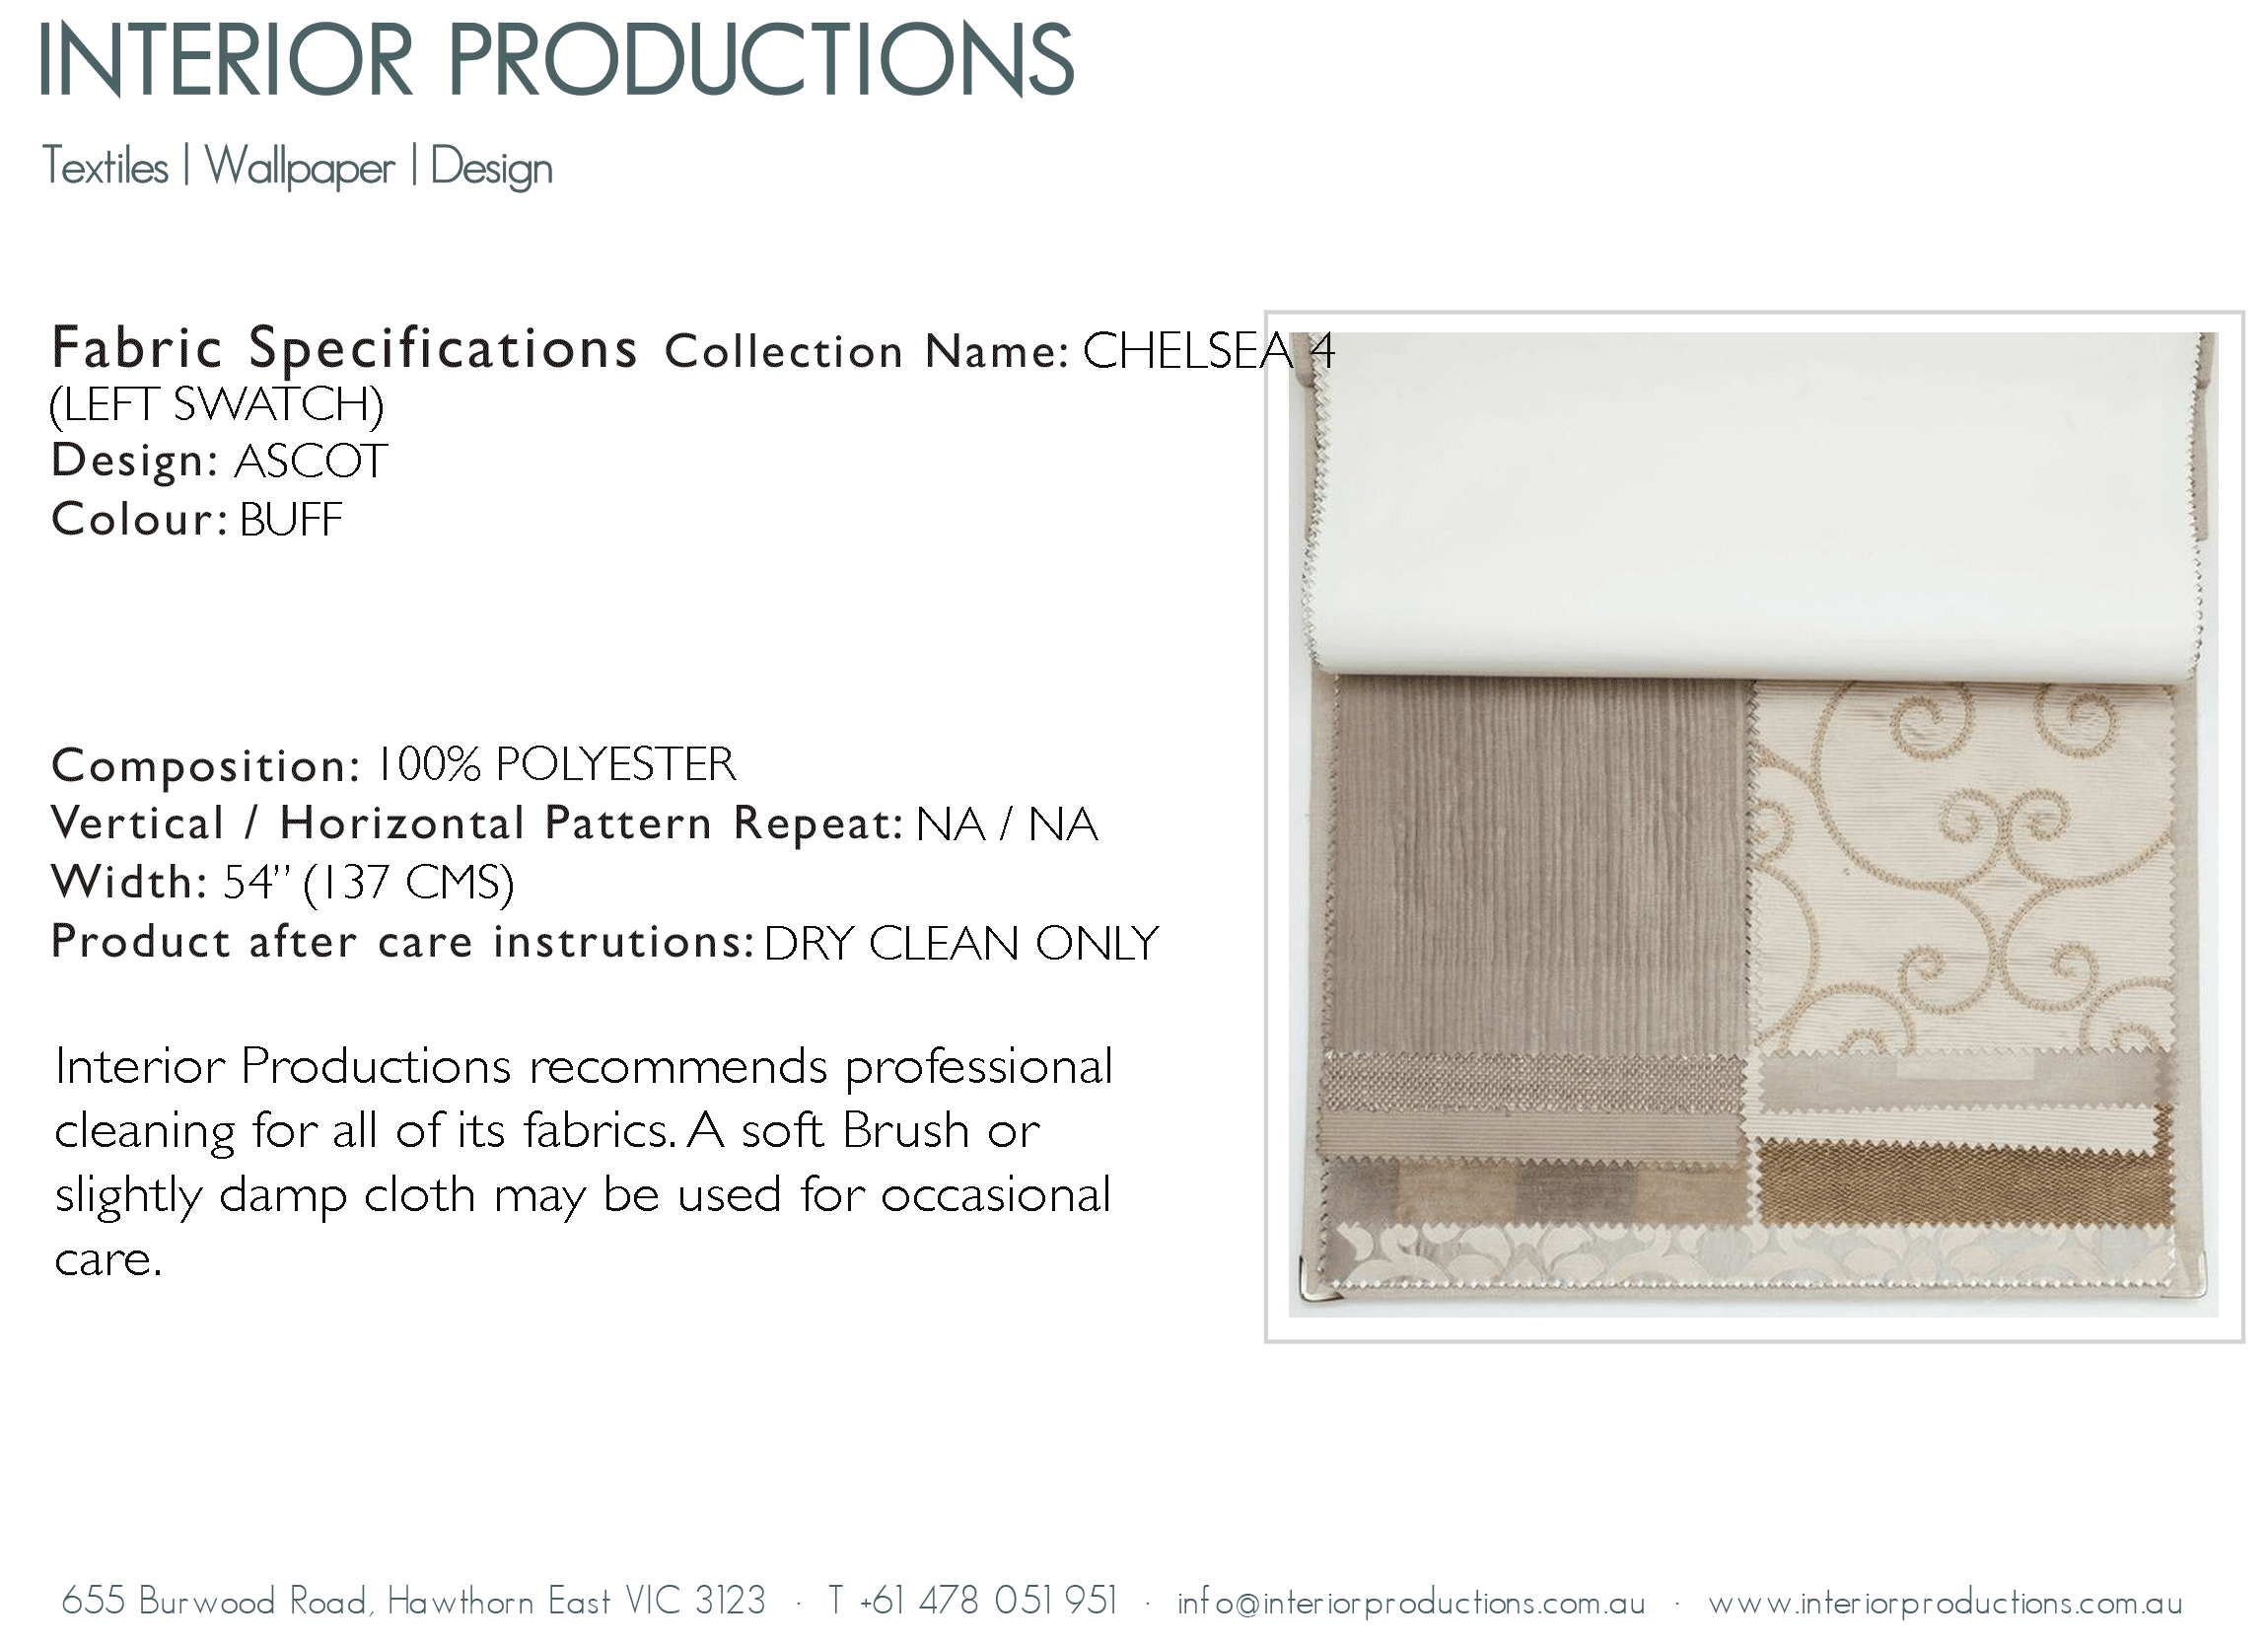 interior_productions_ASCOT---BUFF